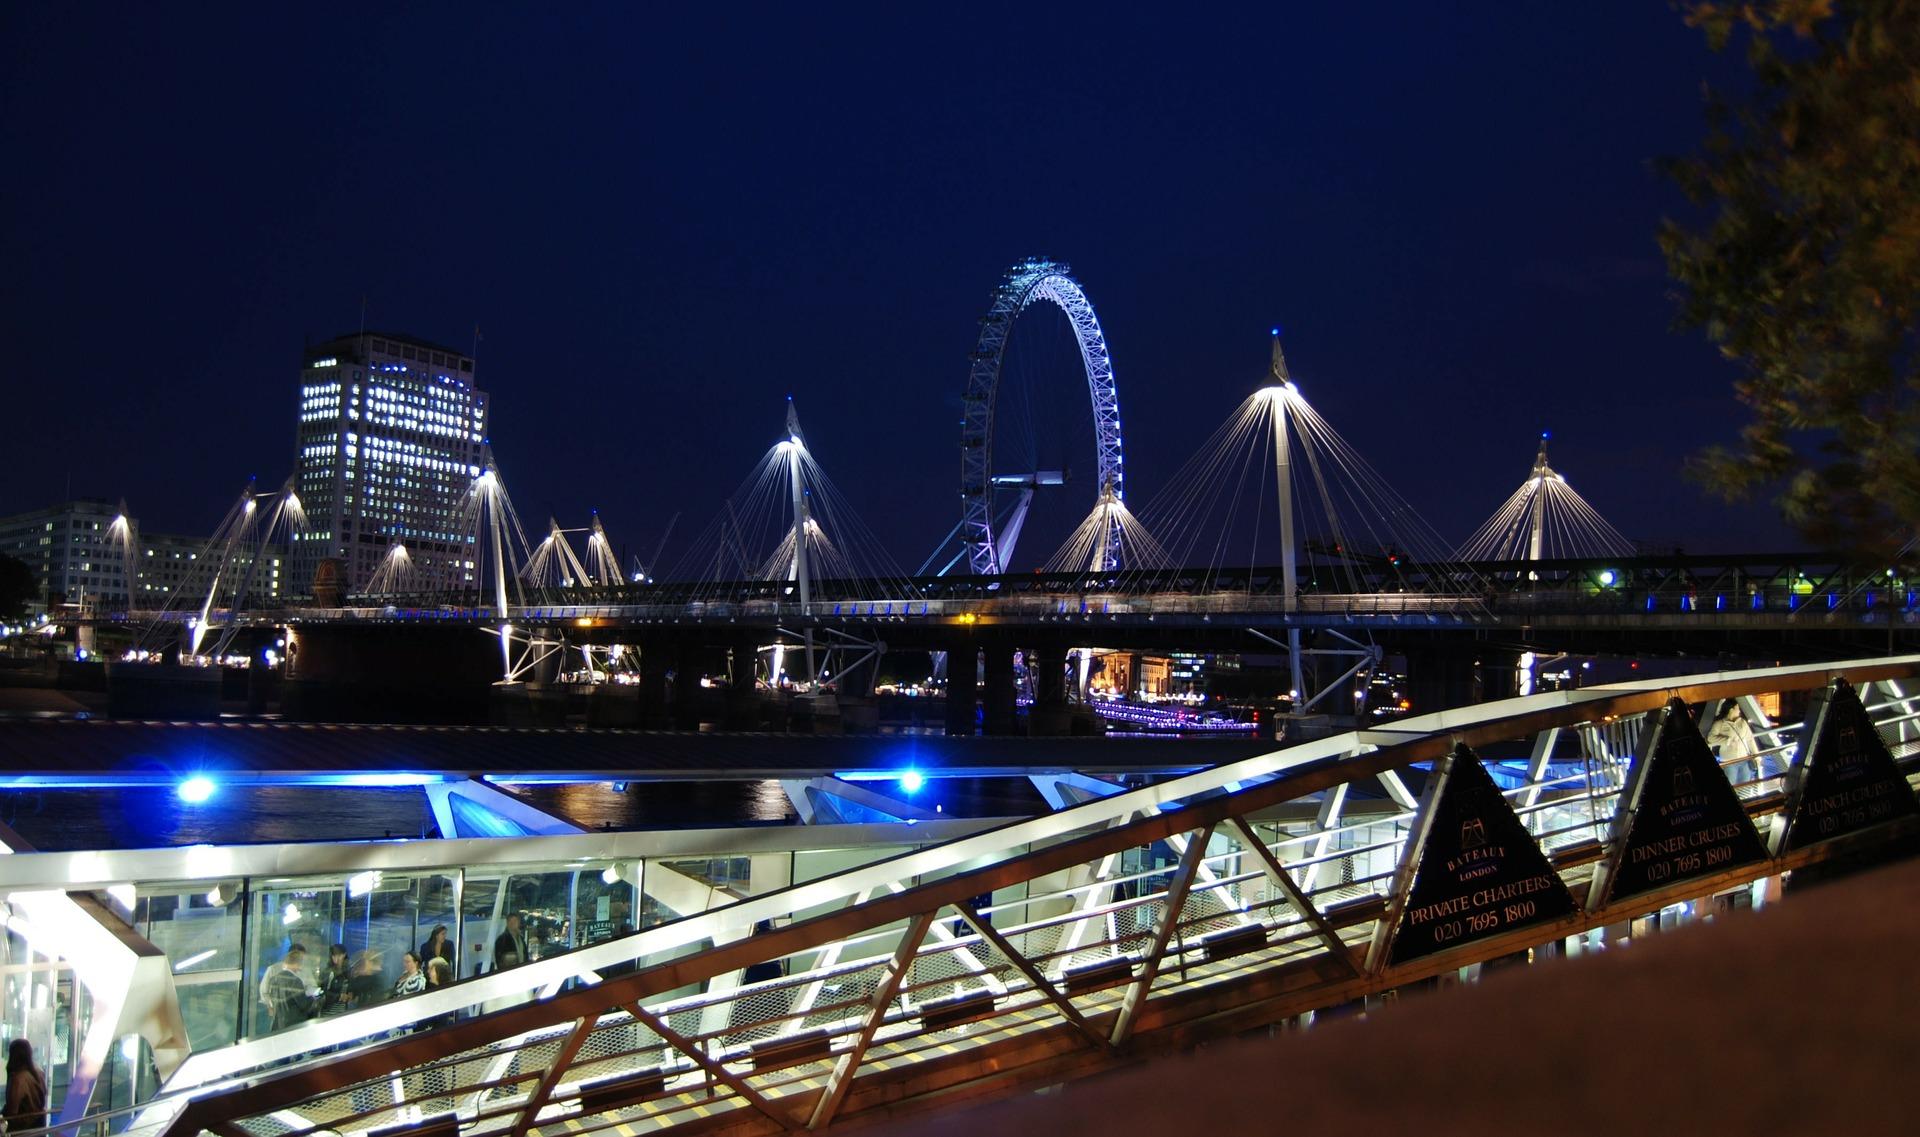 london-eye-343401_1920